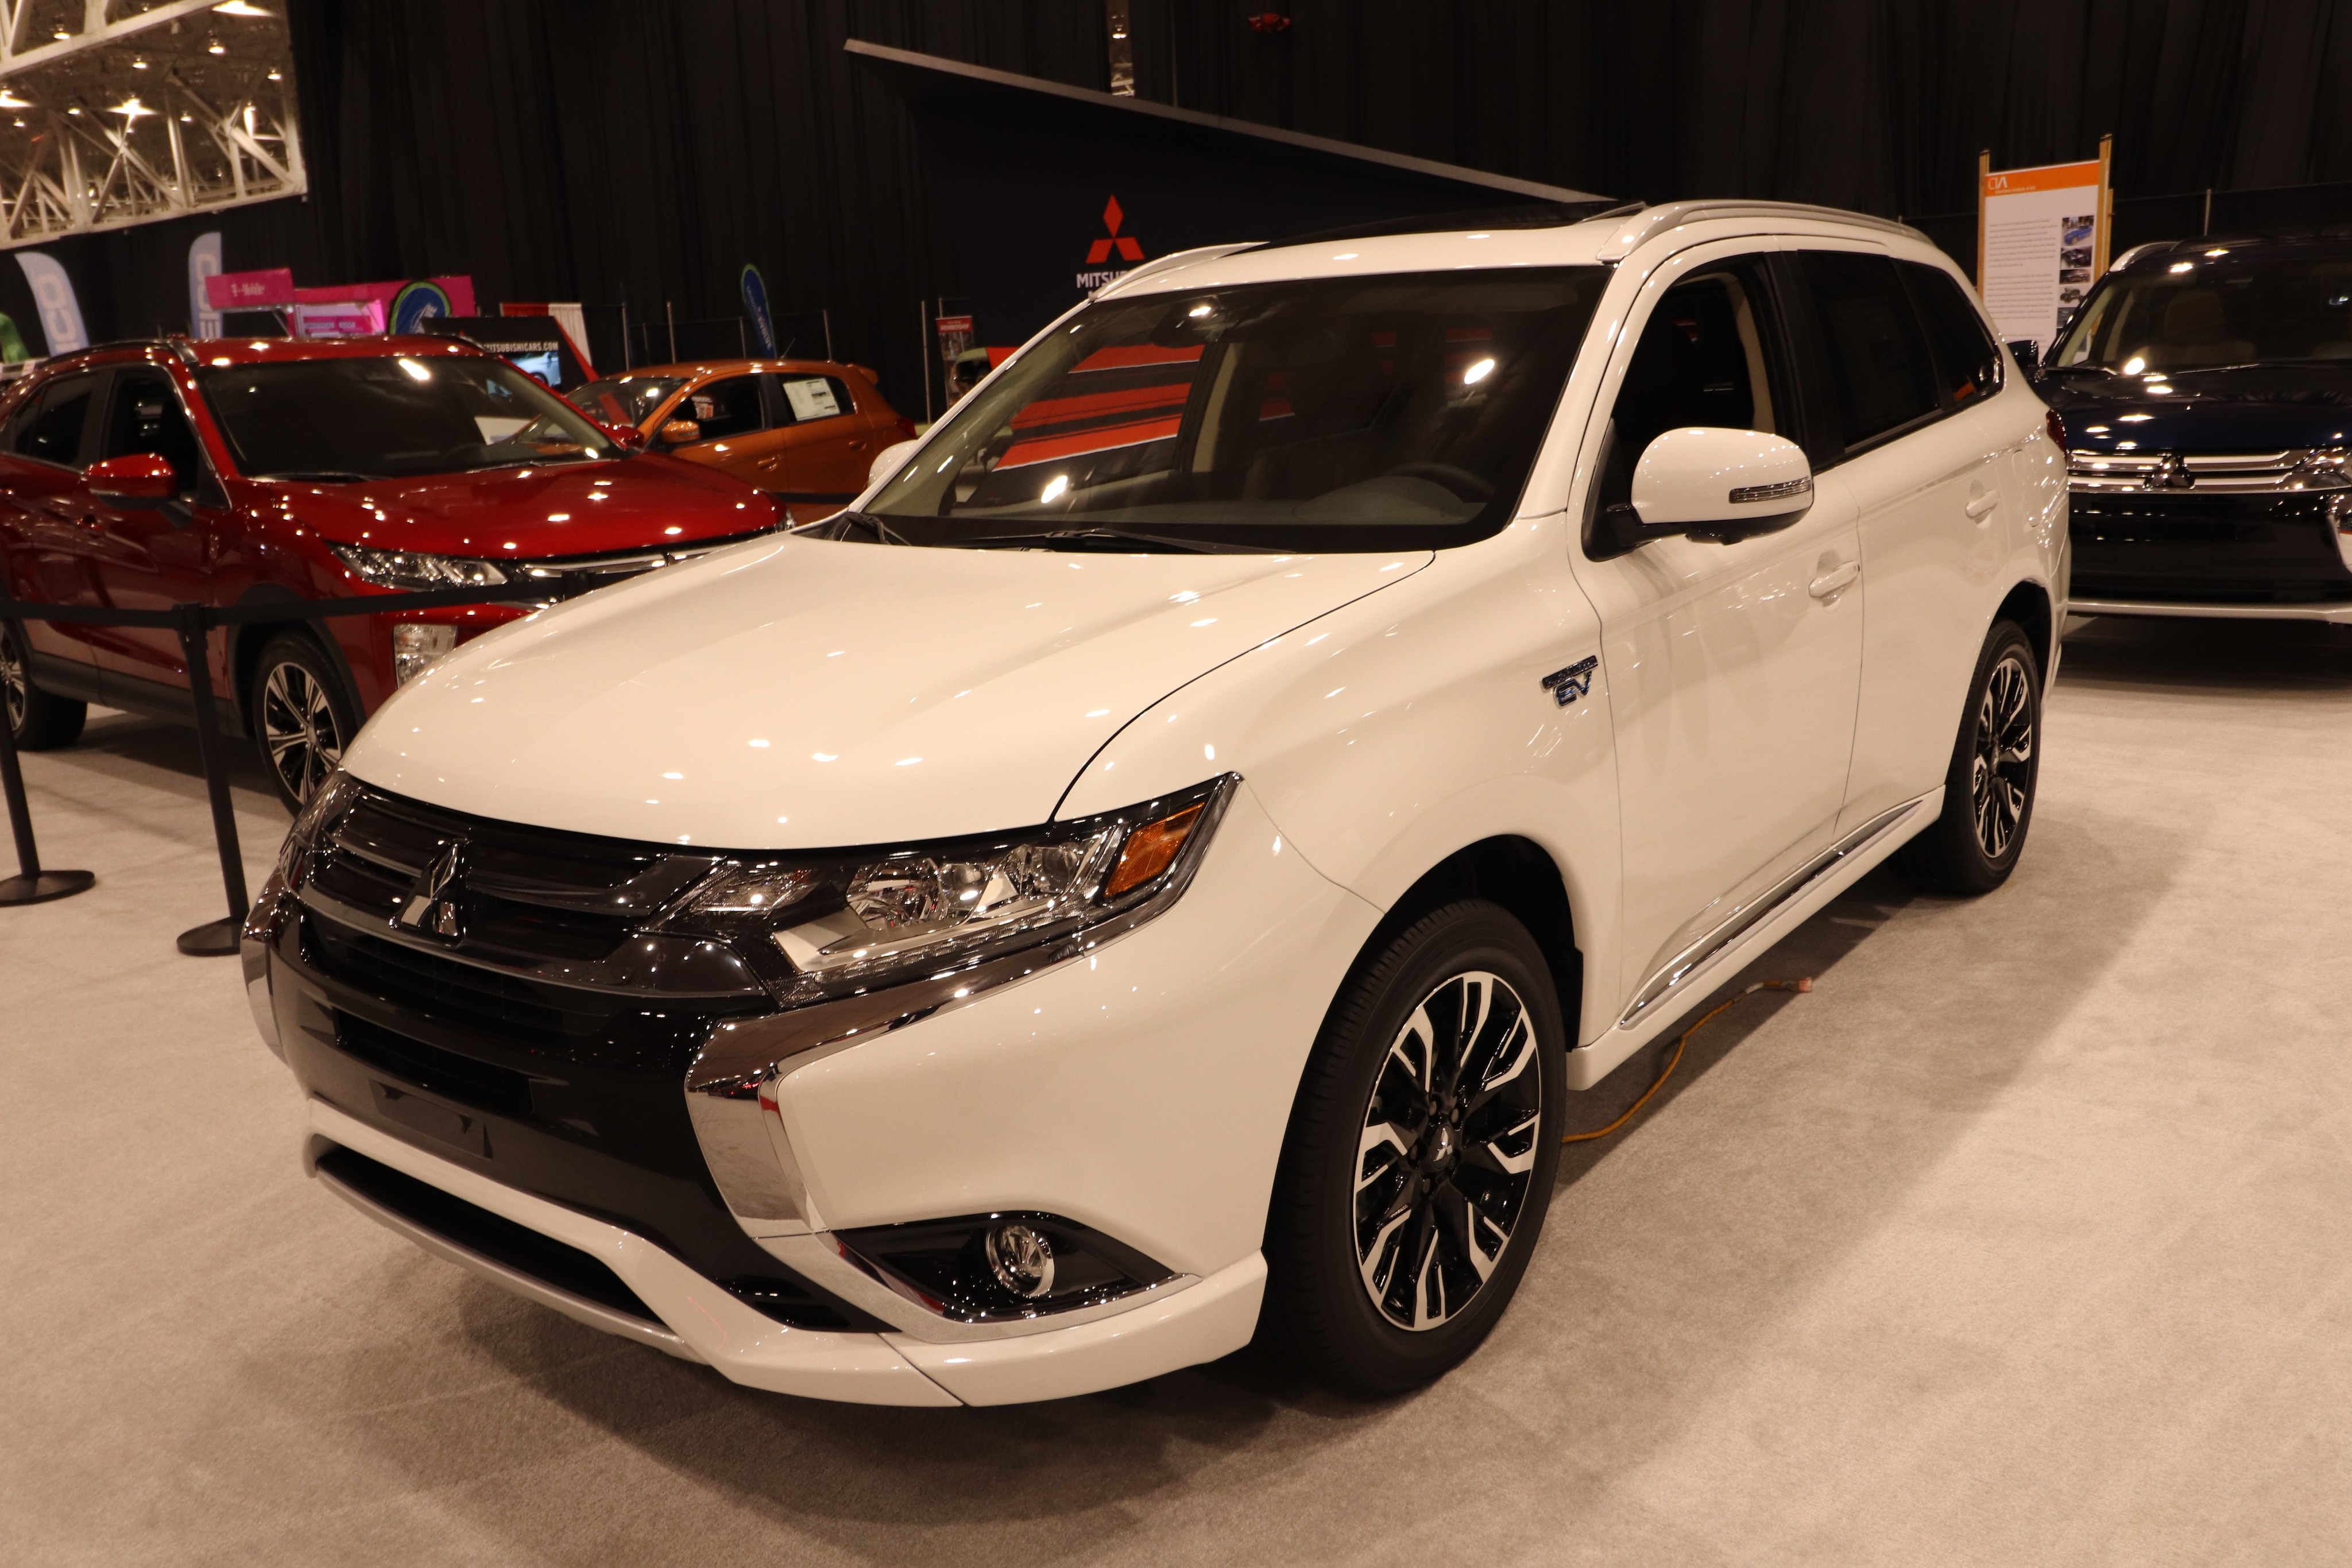 Waikem Mitsubishi Mitsubishi Outlander PHEV Photos From The - Cleveland car show